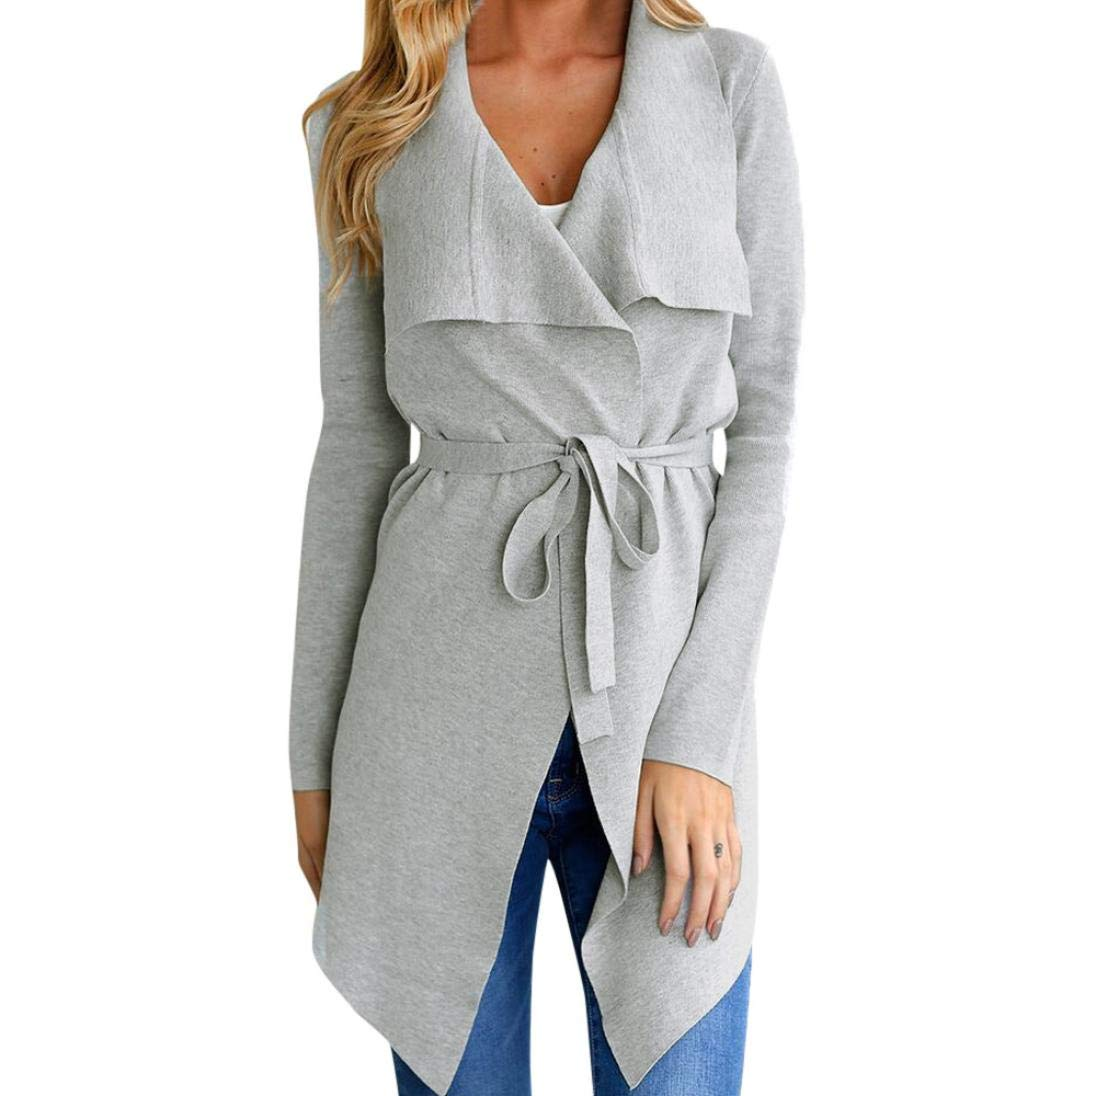 Pandaie Womens Jacket,Women Ladies Long Sleeve Cardigan Coat Suit Top Open Front Jacket Outwear GY/S